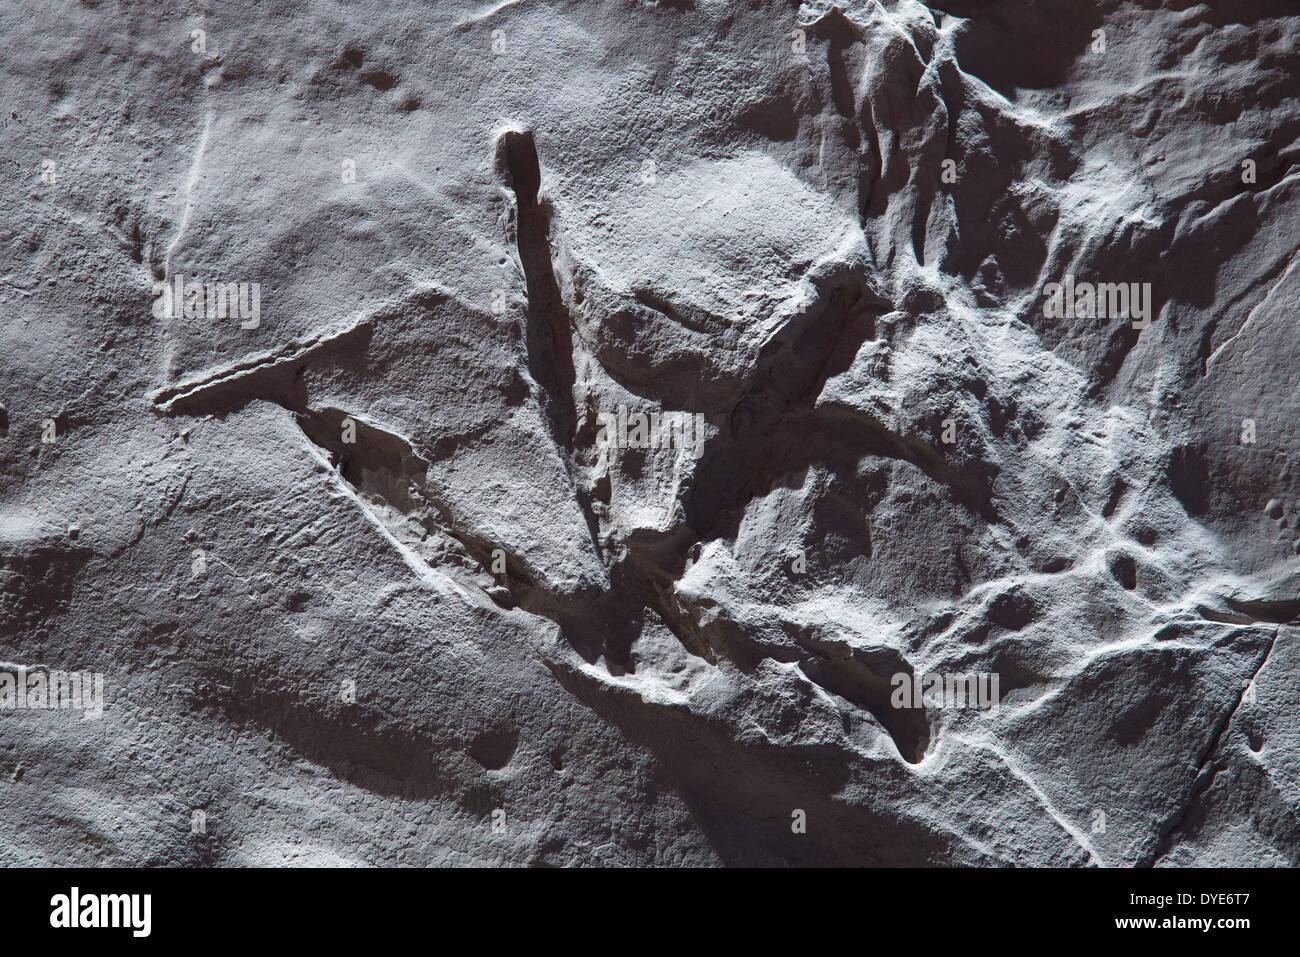 A bird-like three-toed dinosaur footprint left in a mud-rock. - Stock Image